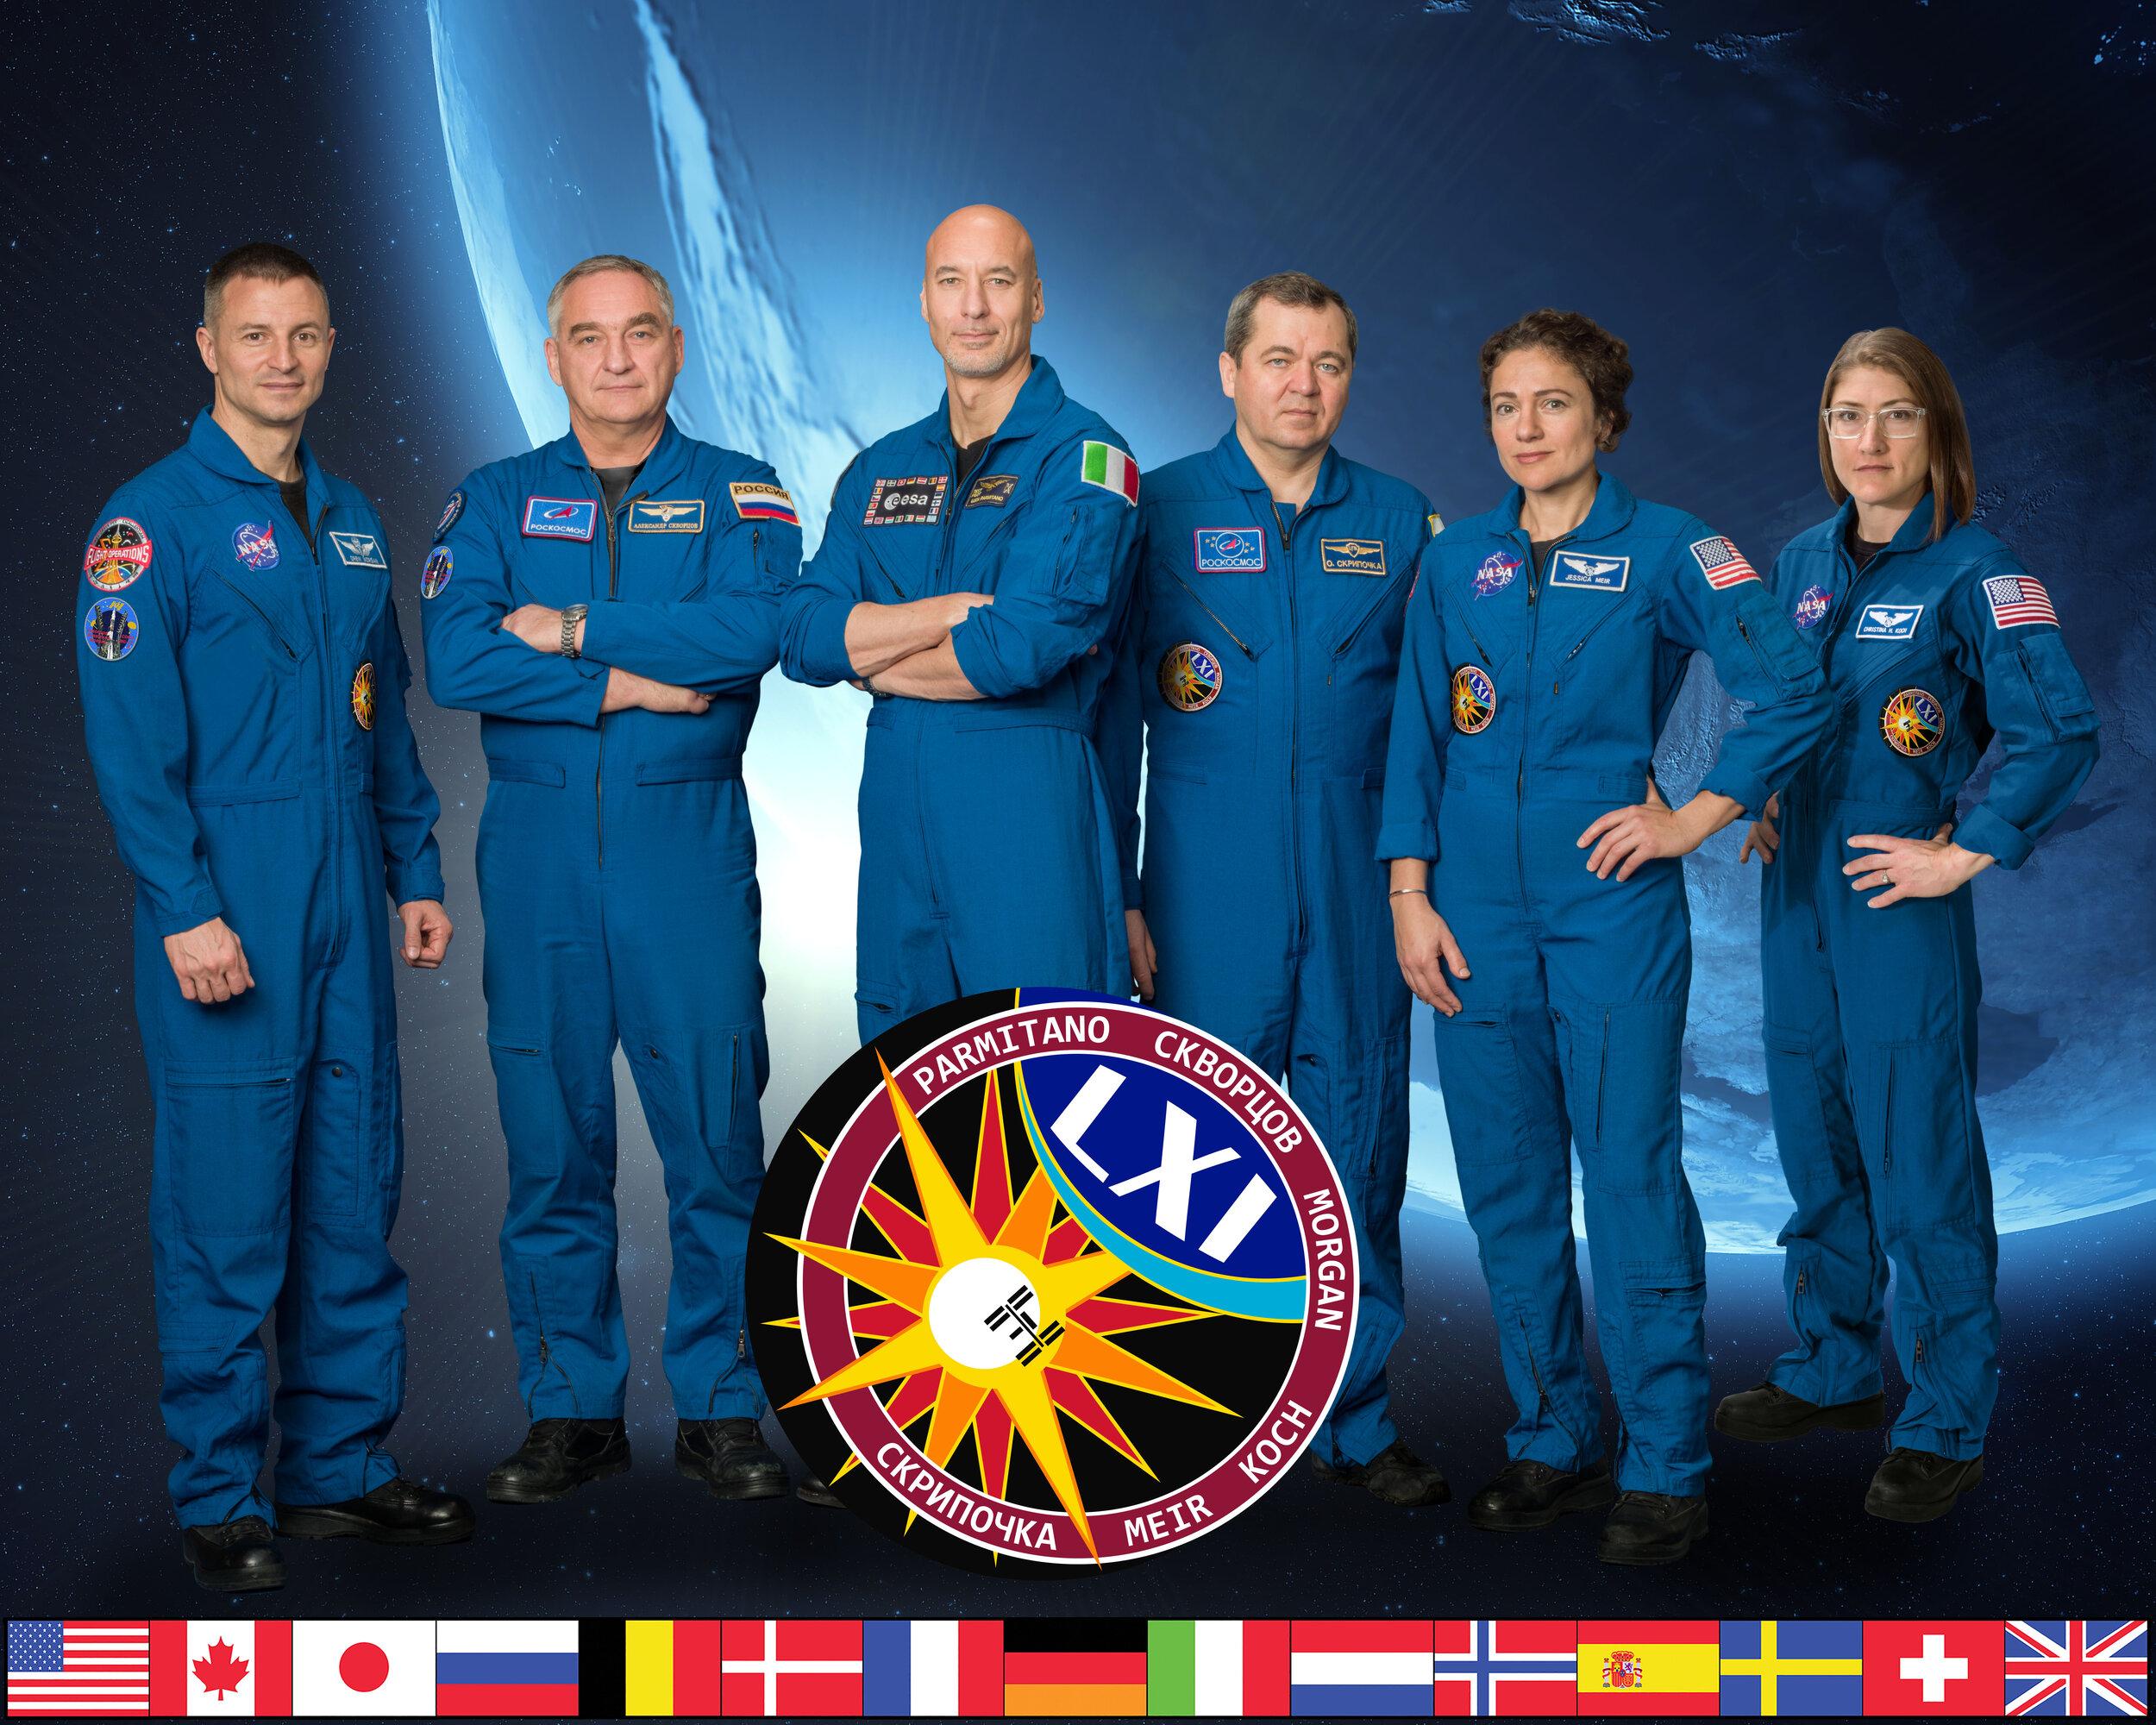 Expedition_61_crew_portrait.jpg